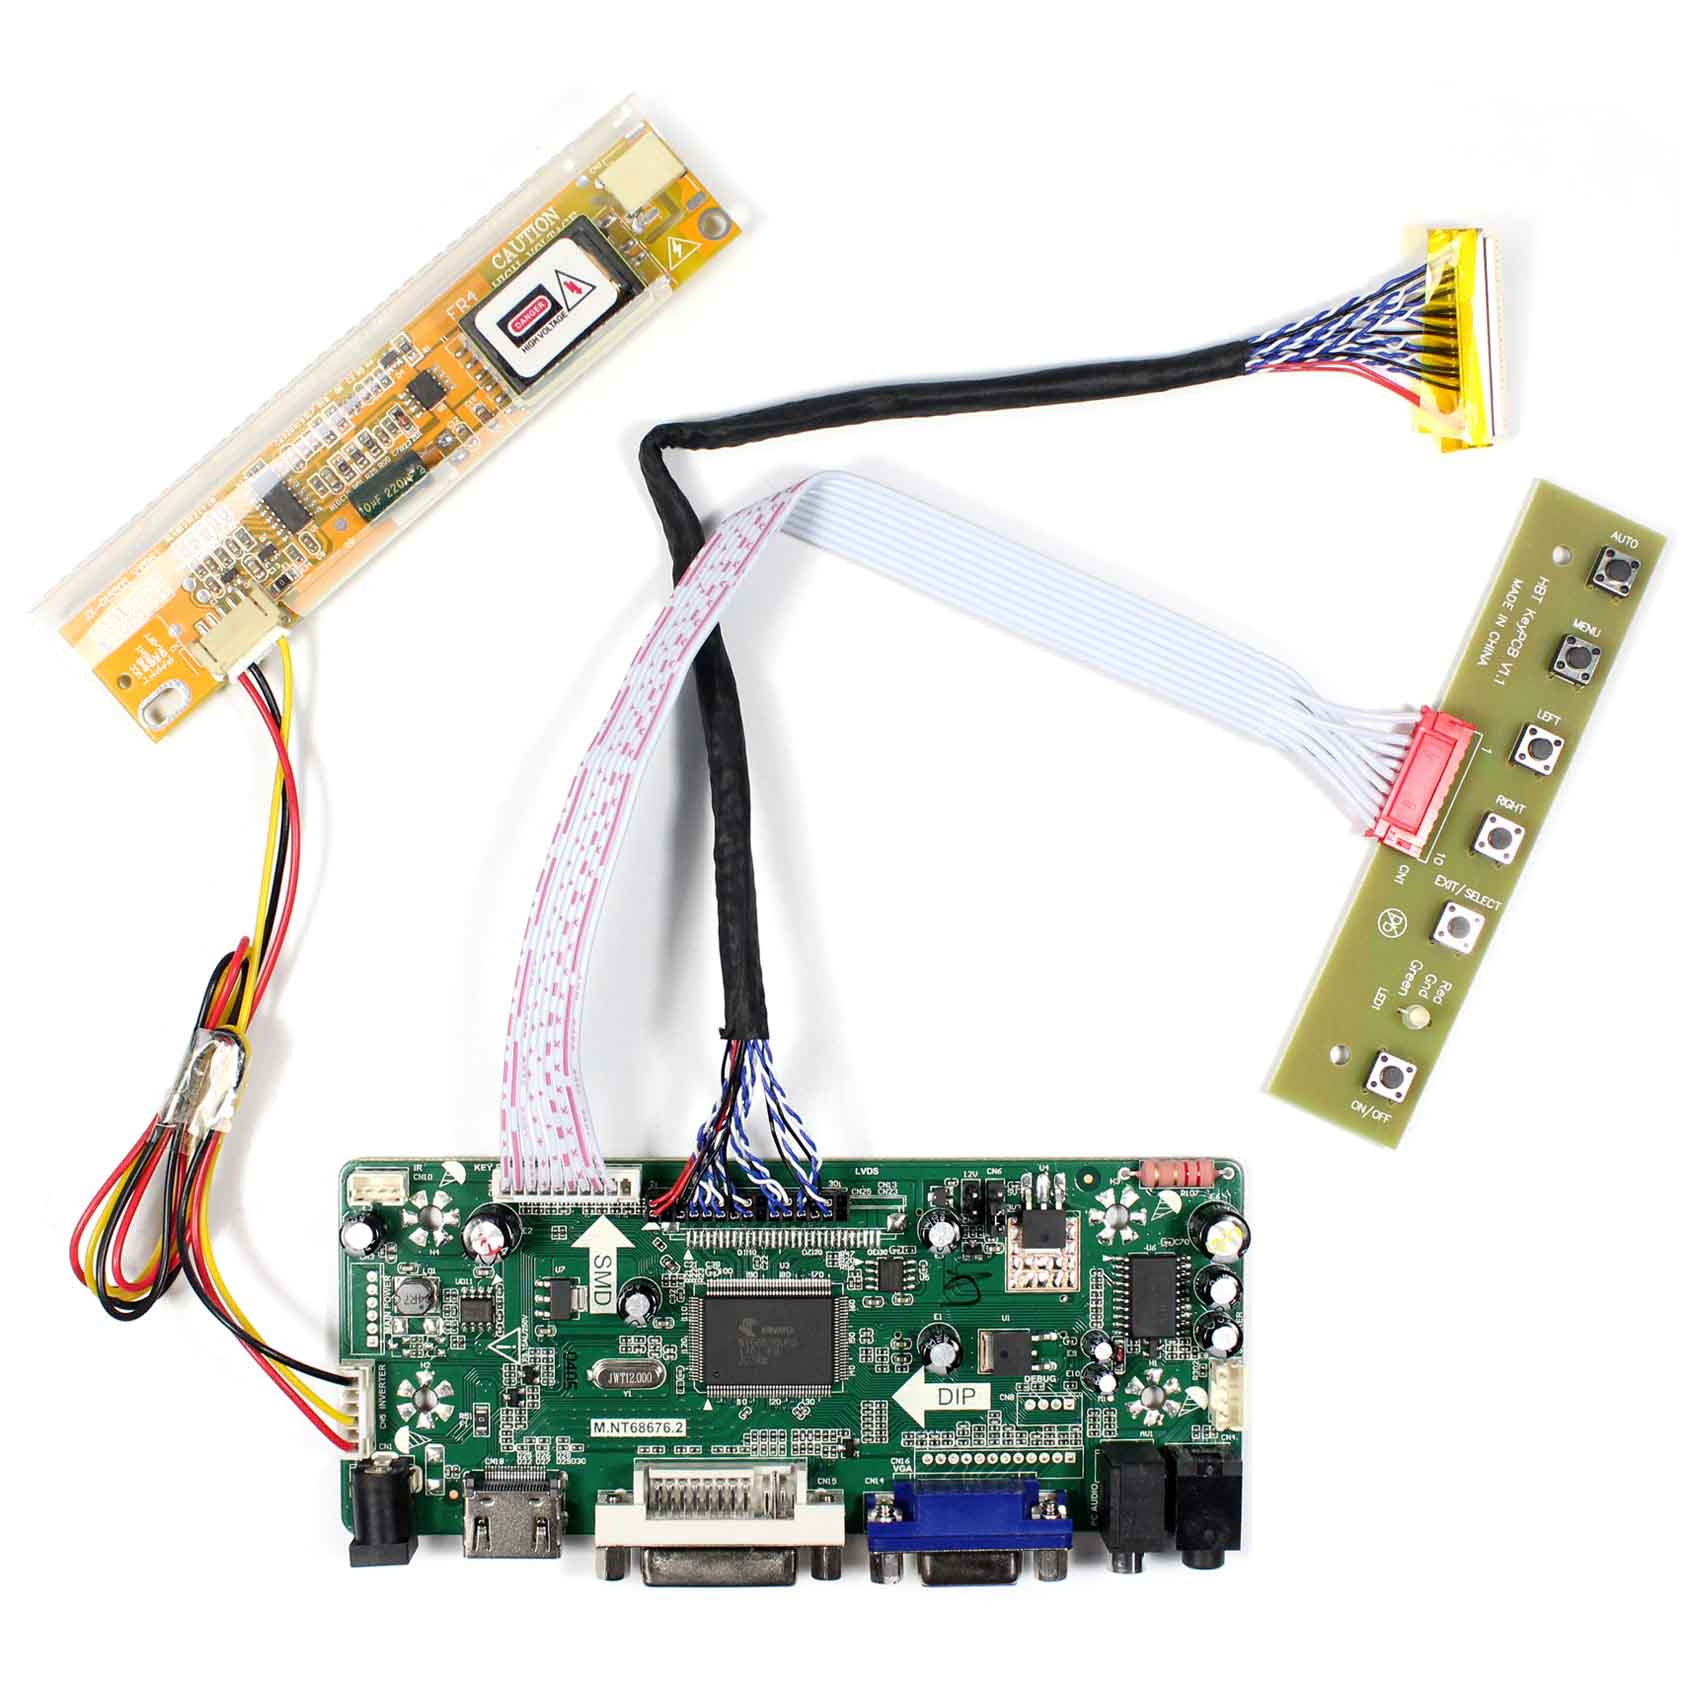 HDMI VGA DVI Audio LCD Controller Board For 17 B170PW03 B170PW06 LP171WP4 LTN170X2 1440x900 LCD ScreenHDMI VGA DVI Audio LCD Controller Board For 17 B170PW03 B170PW06 LP171WP4 LTN170X2 1440x900 LCD Screen